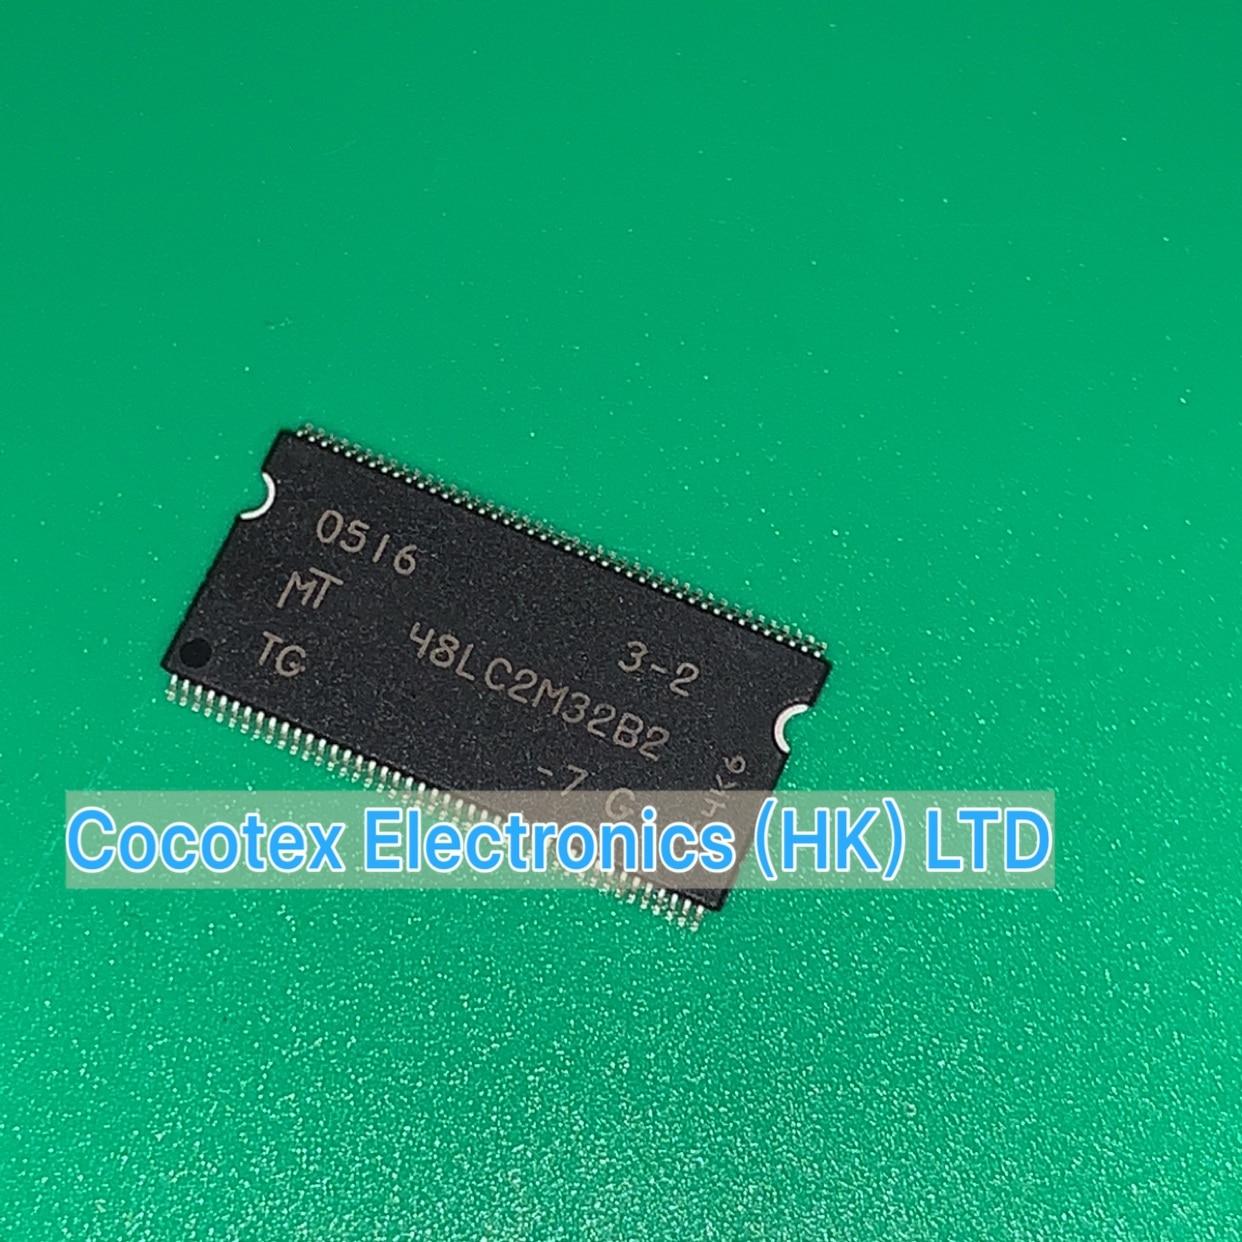 2pcs MT48LC16M16A2P-6A:G DRAM Chip SDRAM 256Mbit 16Mx16 3.3V TSOP-54